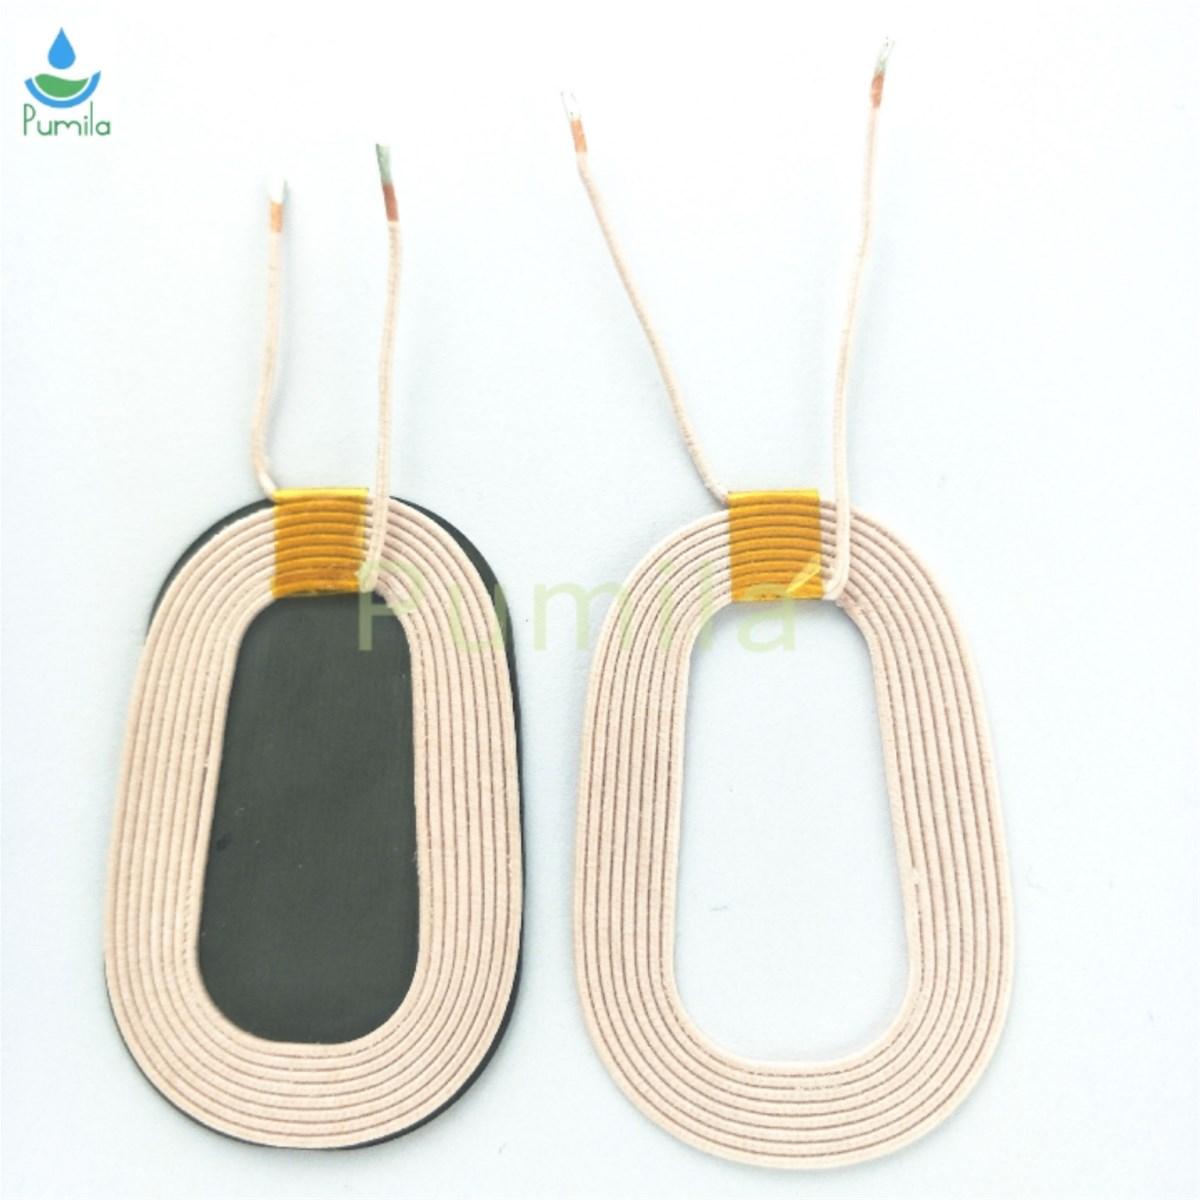 Qi Wireless 10W PCBA 75W PCBA DIY Circuit Board Coil Module Transmitter Wireless Phone Charger